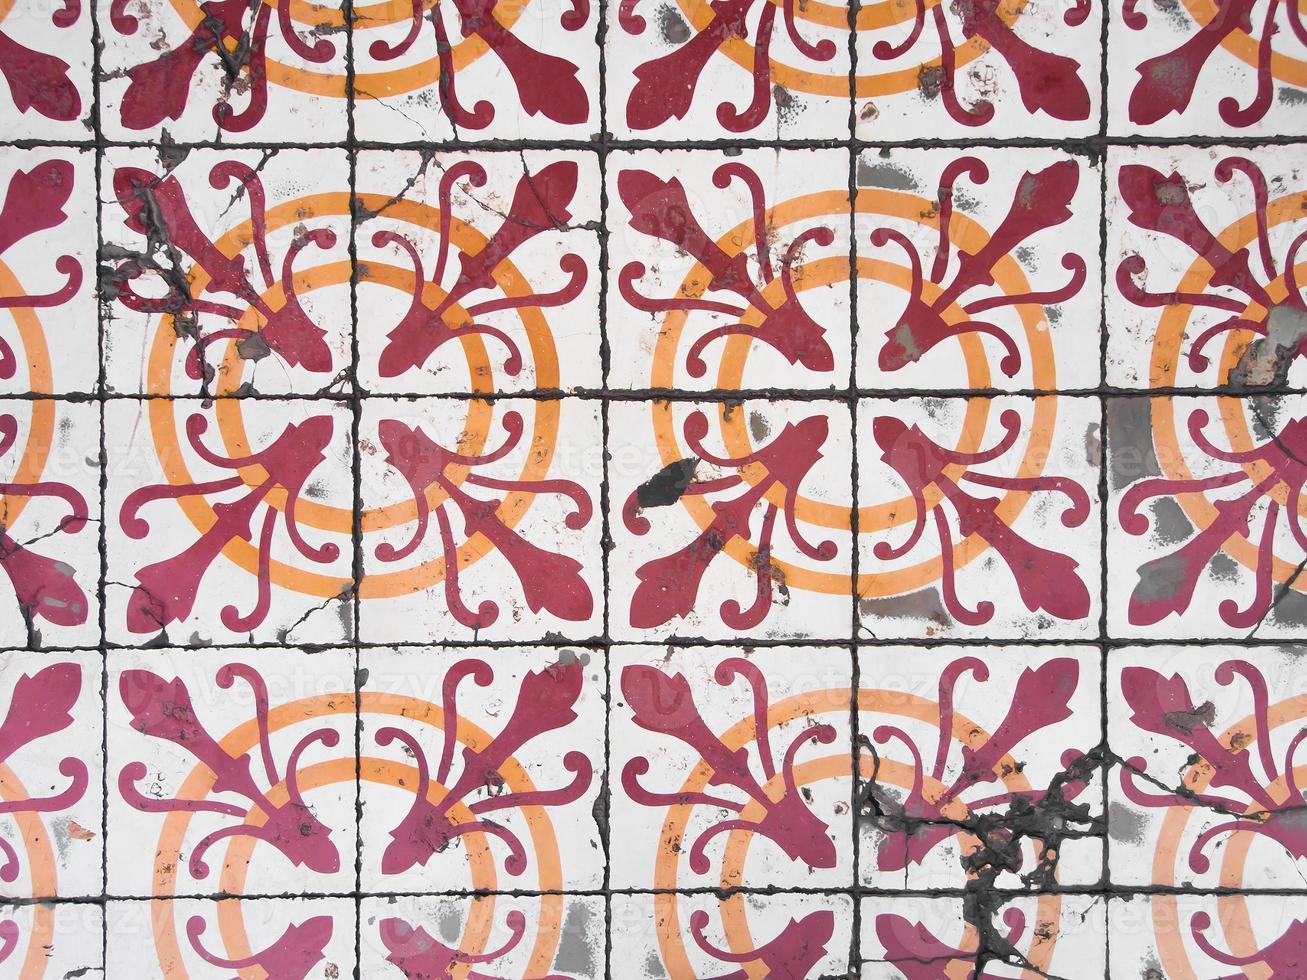 chino portugisiska gamla brickor. foto